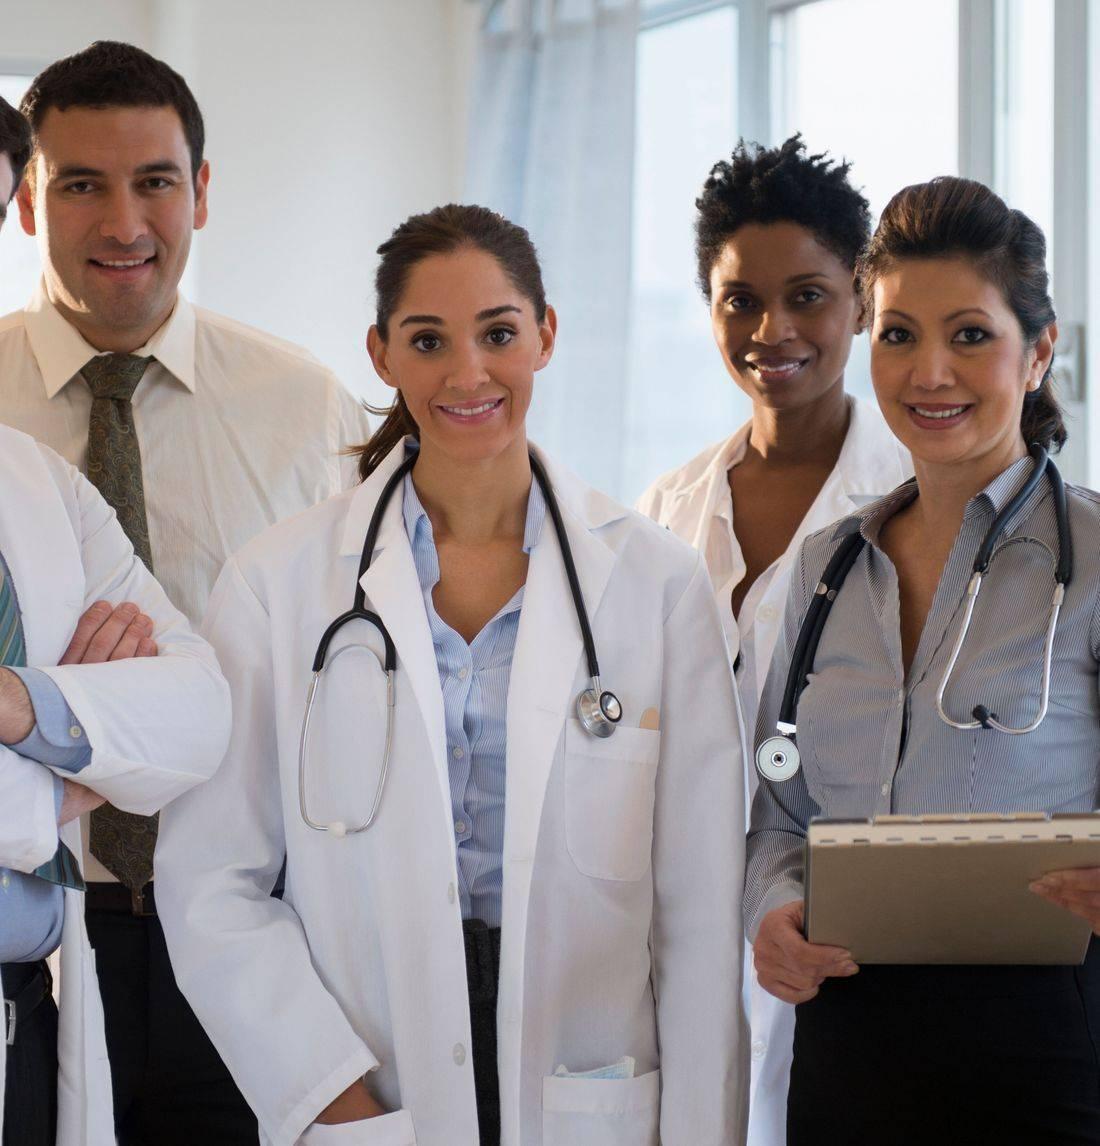 Medicare Providers Dayton Ohio